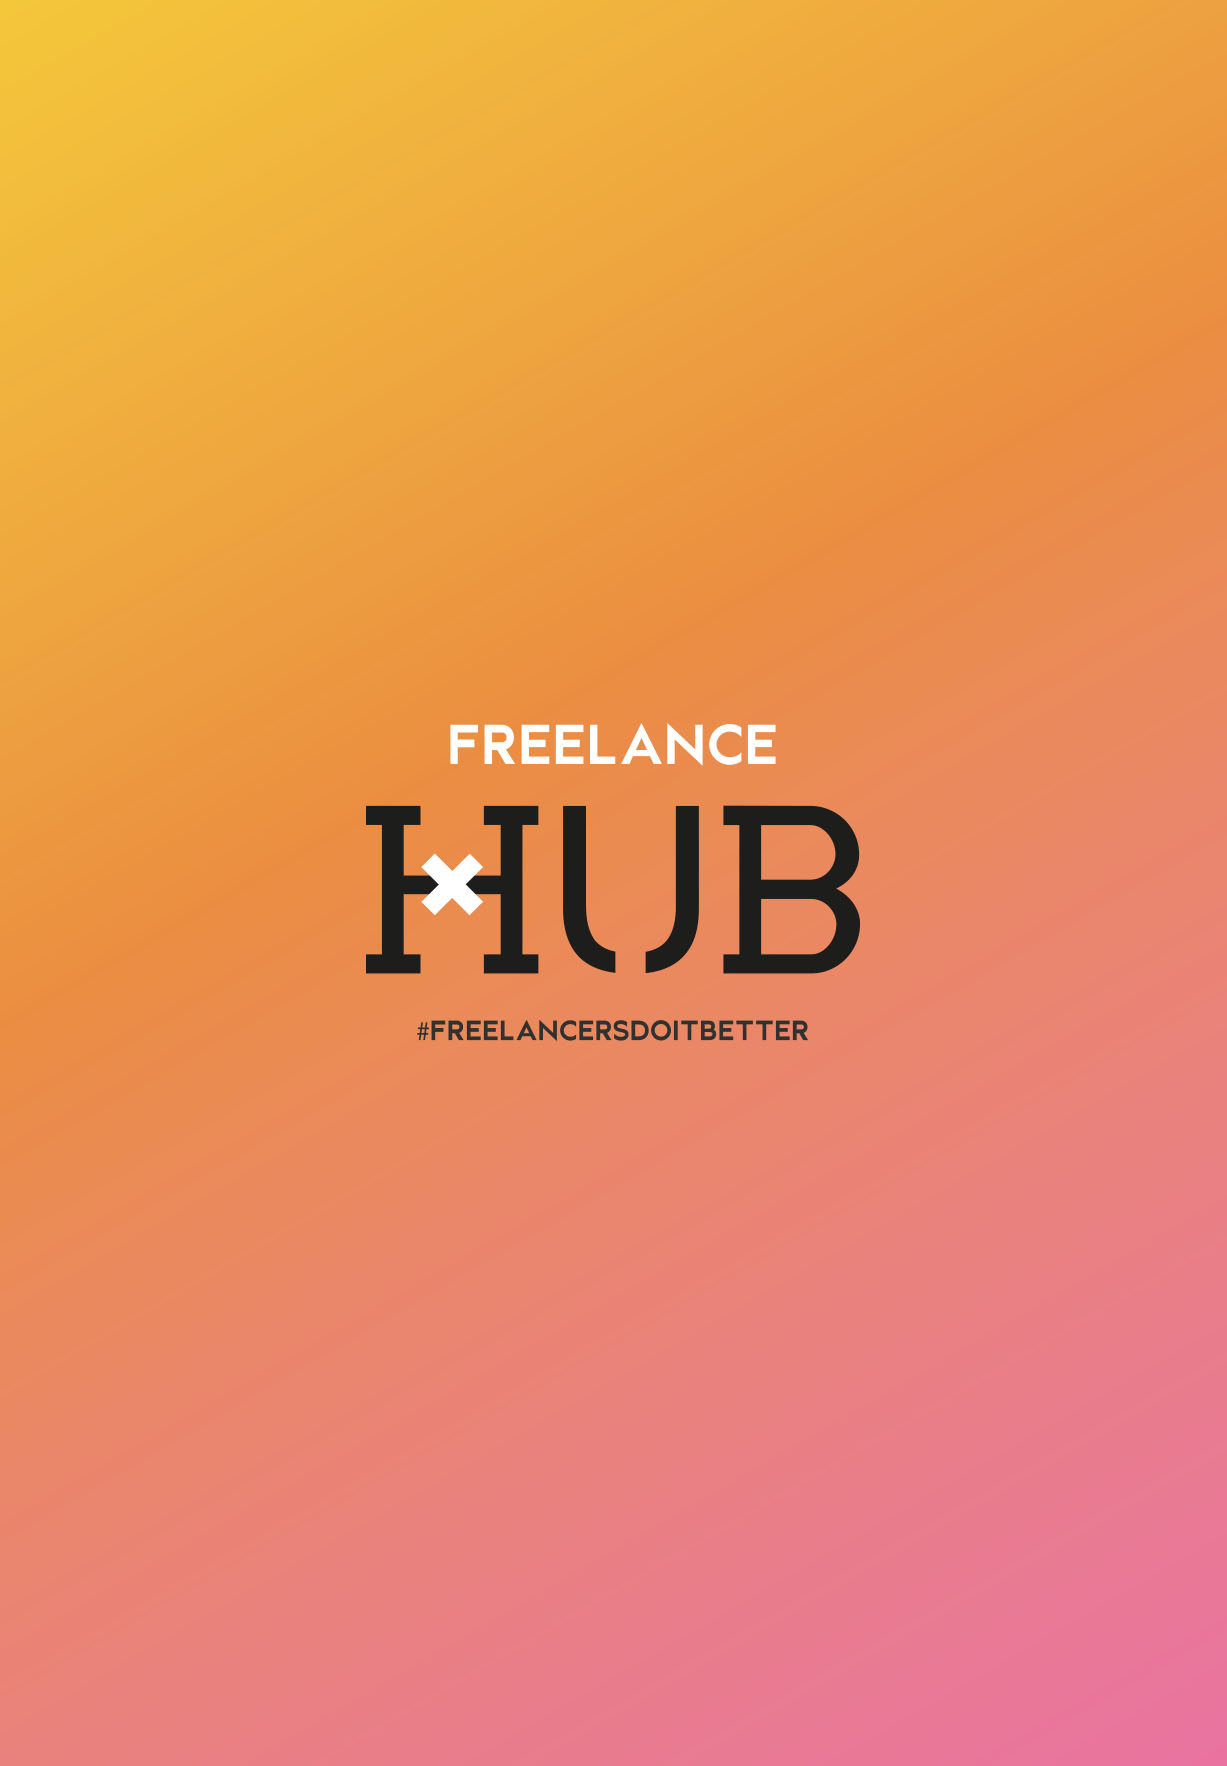 Freelance Hub - The Crew